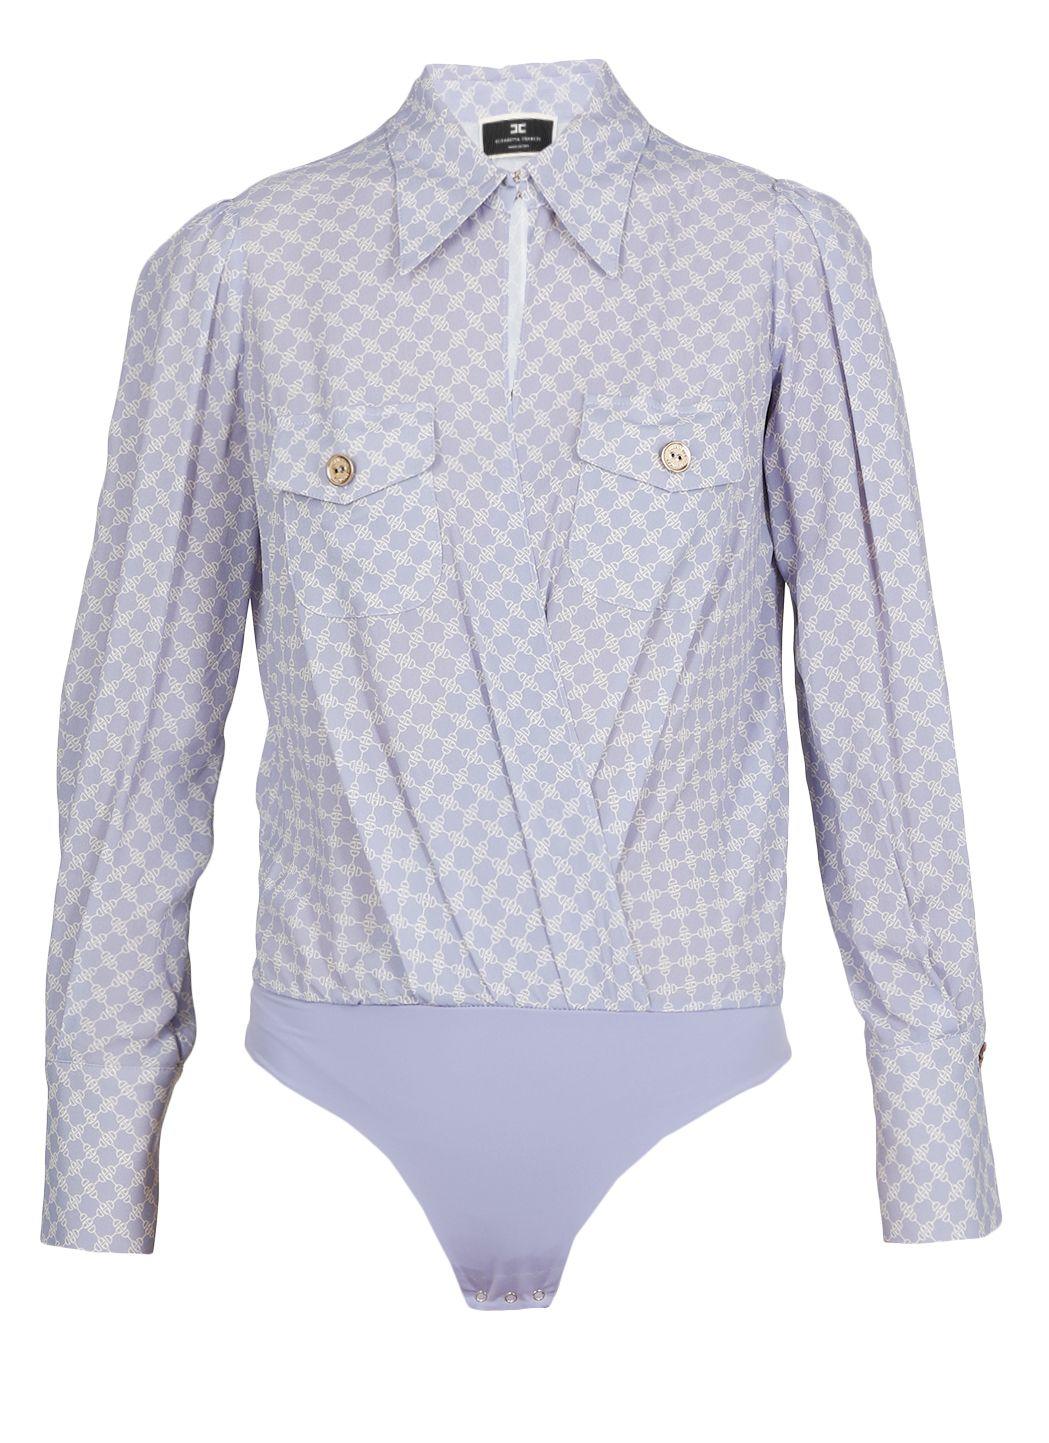 Viscose georgette body shirt